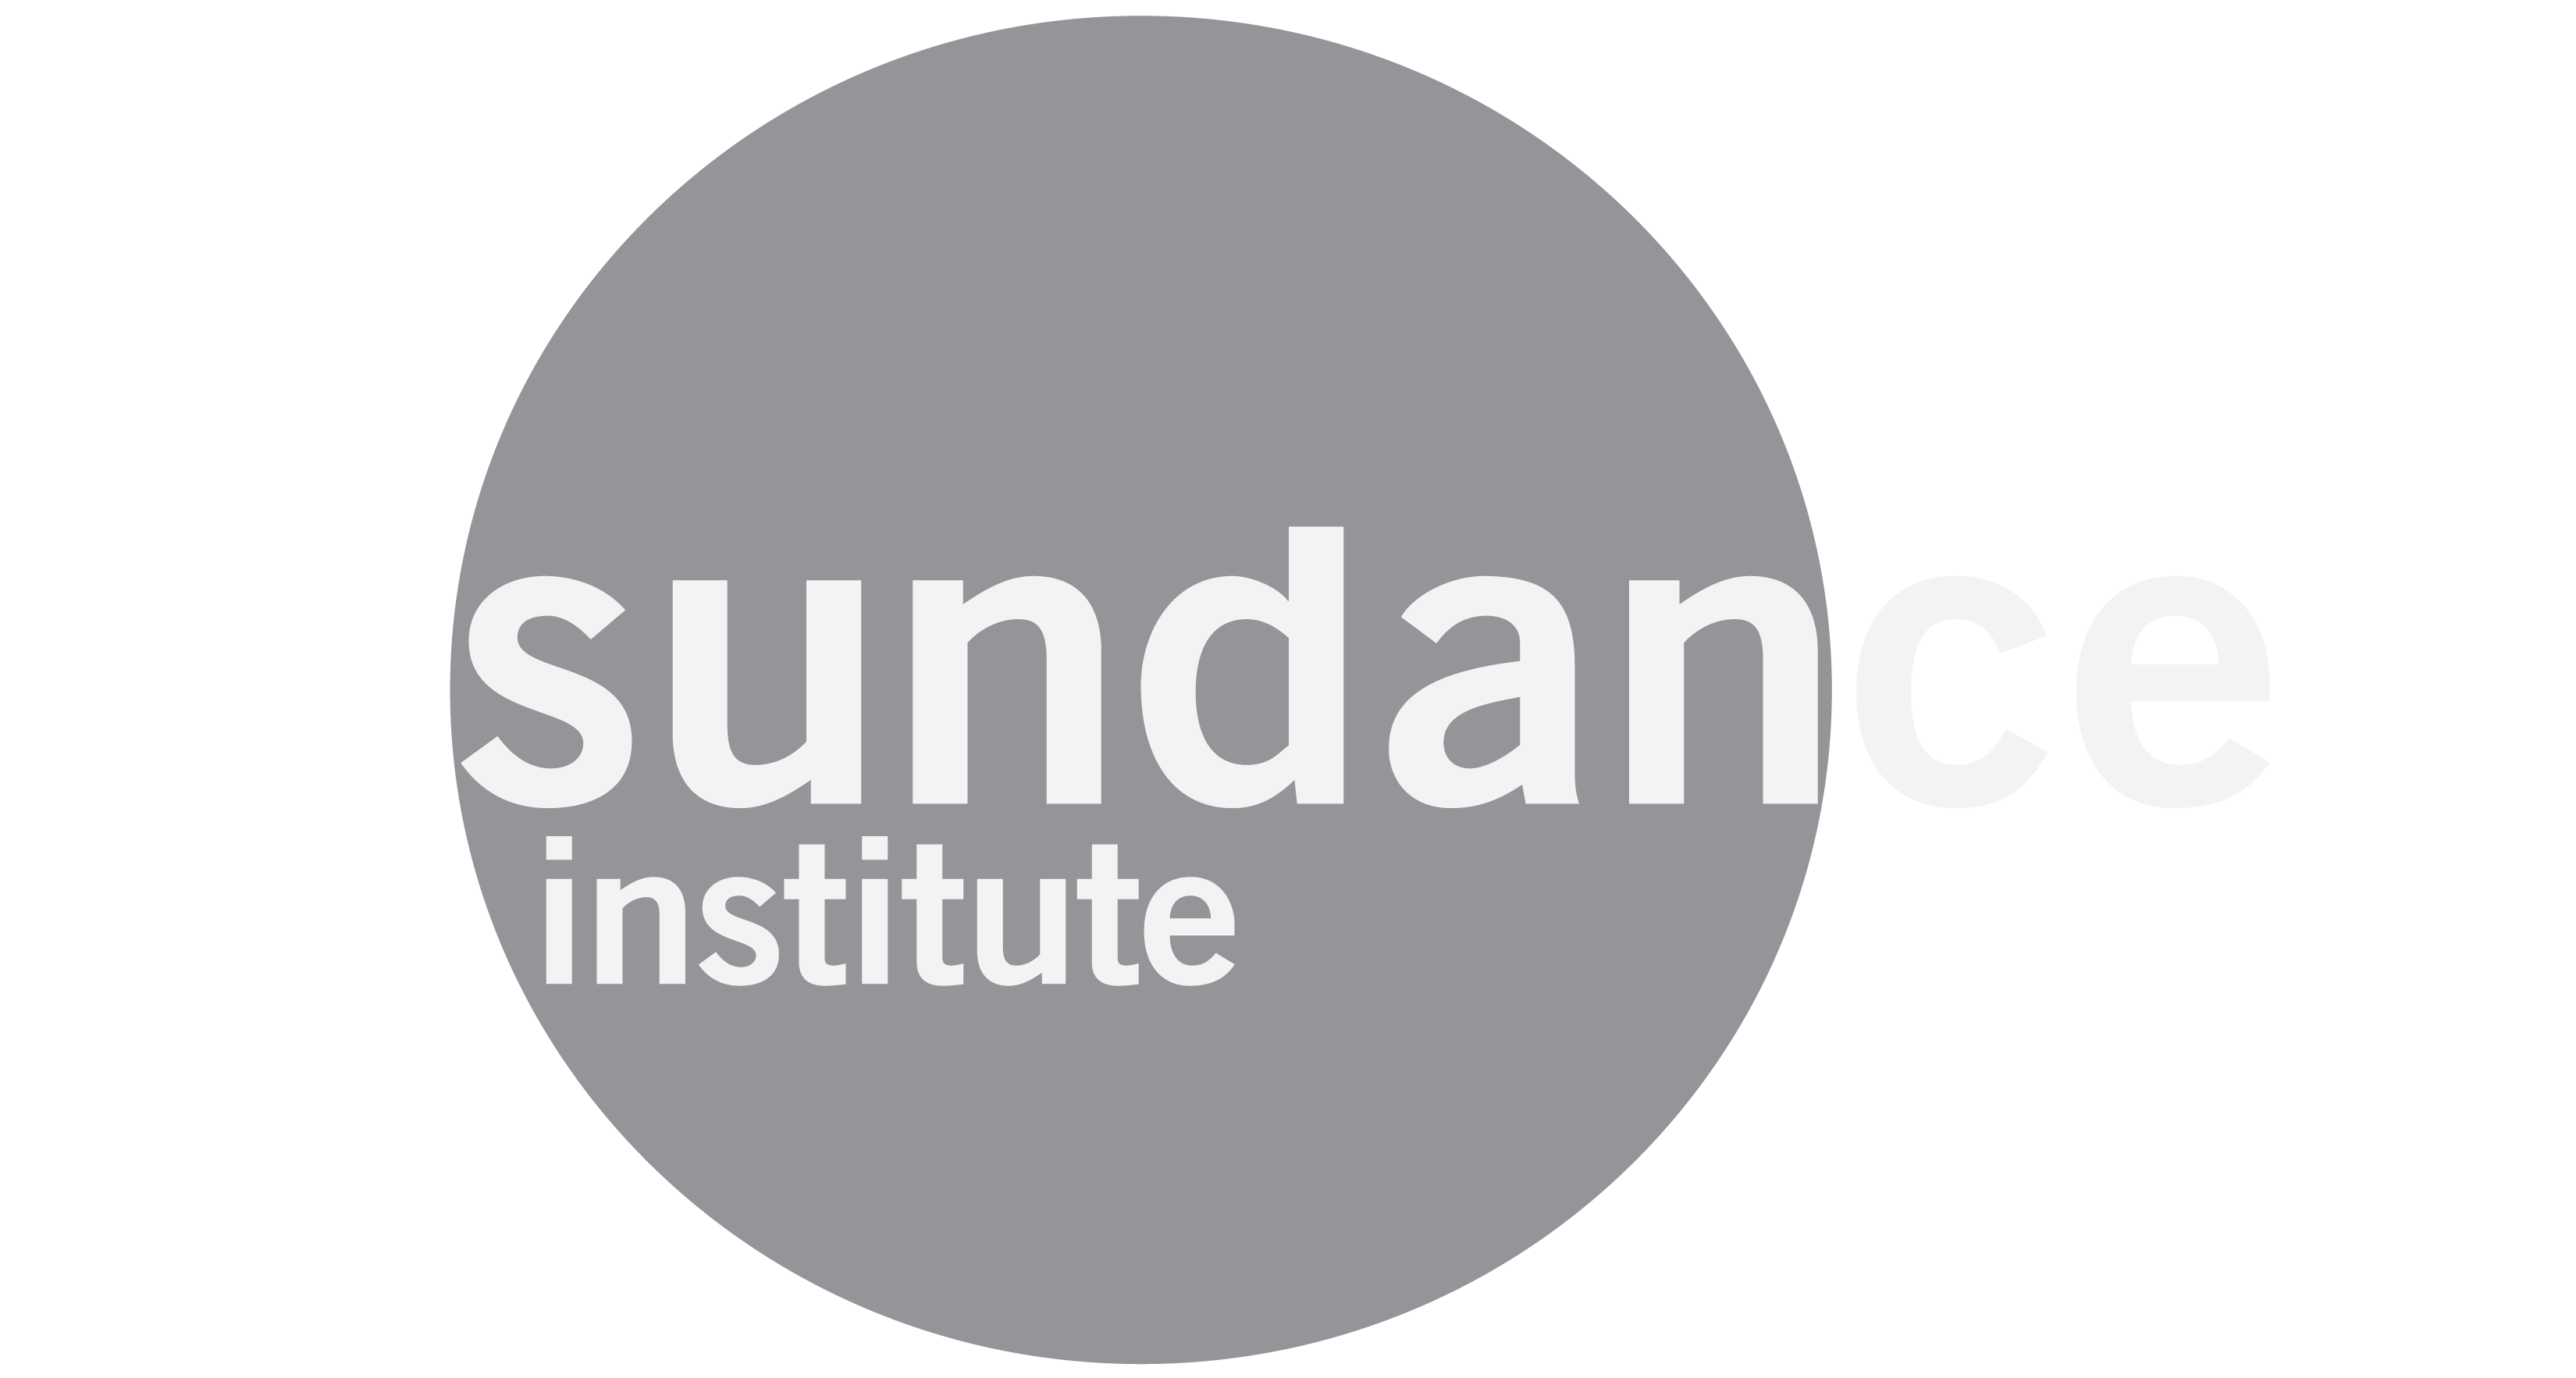 Sundance Institute Resources for Antiracism Work